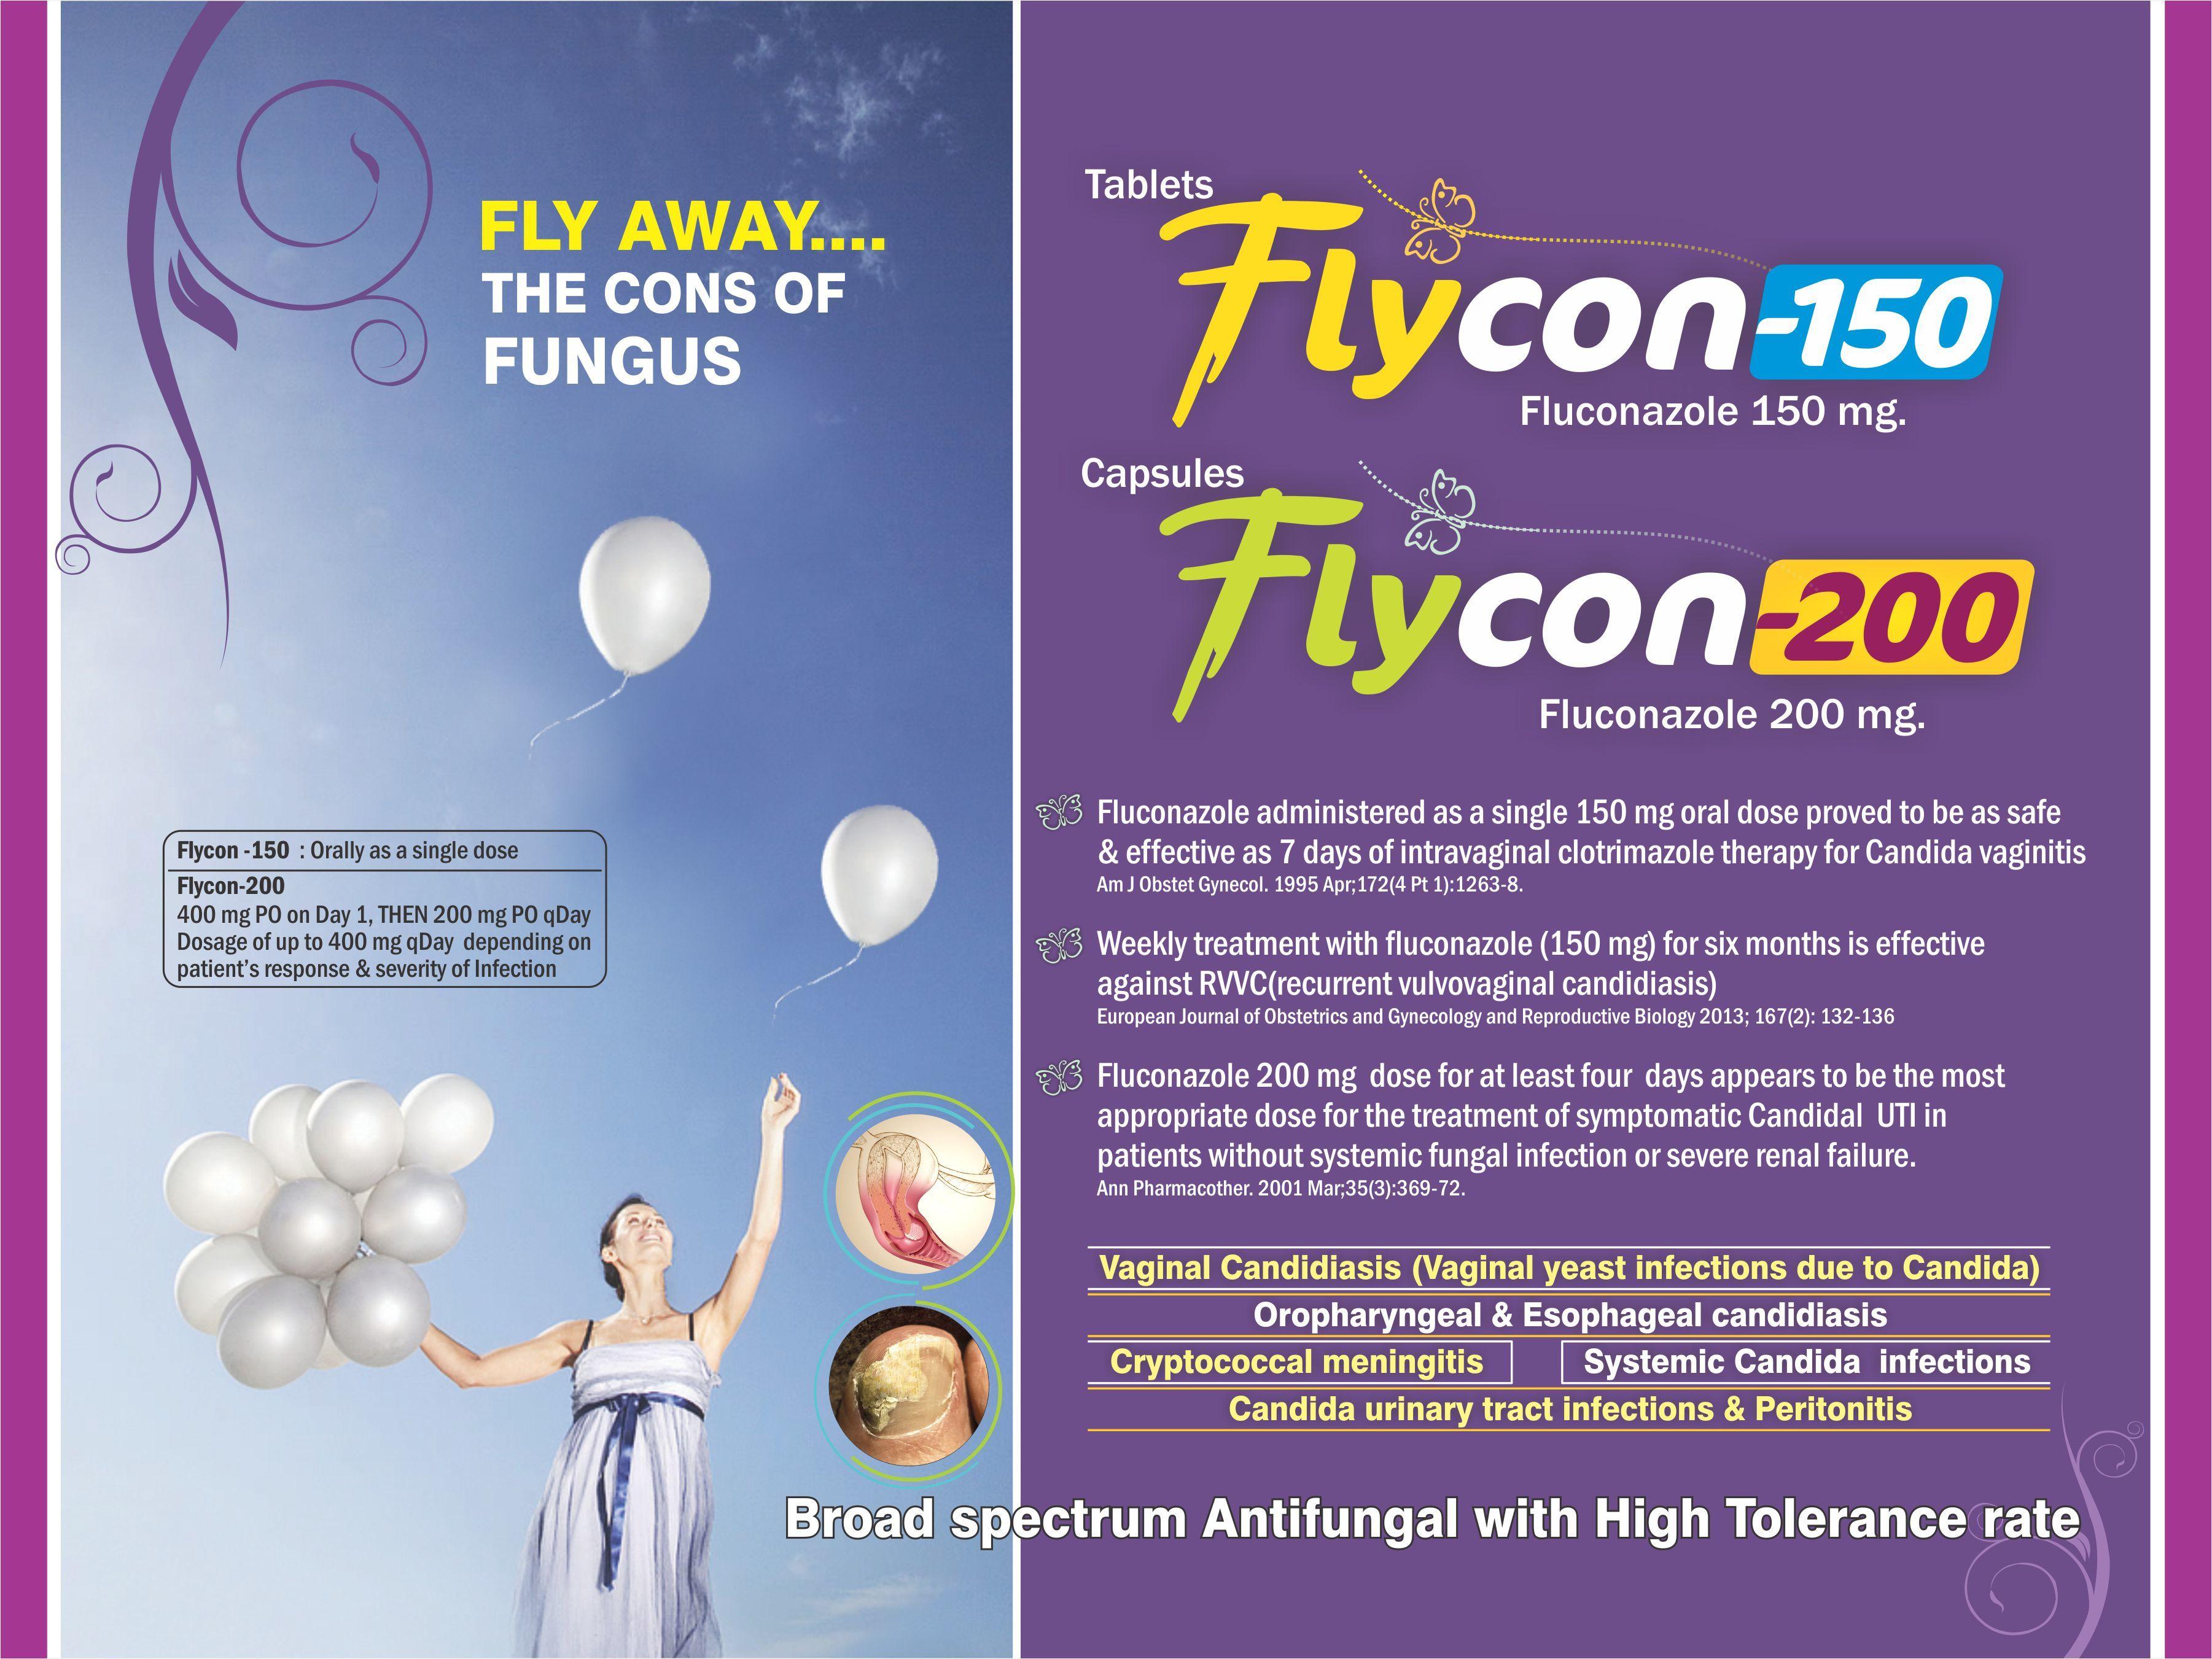 Fluconazole 150 mg Tablet & 200 mg Capsule